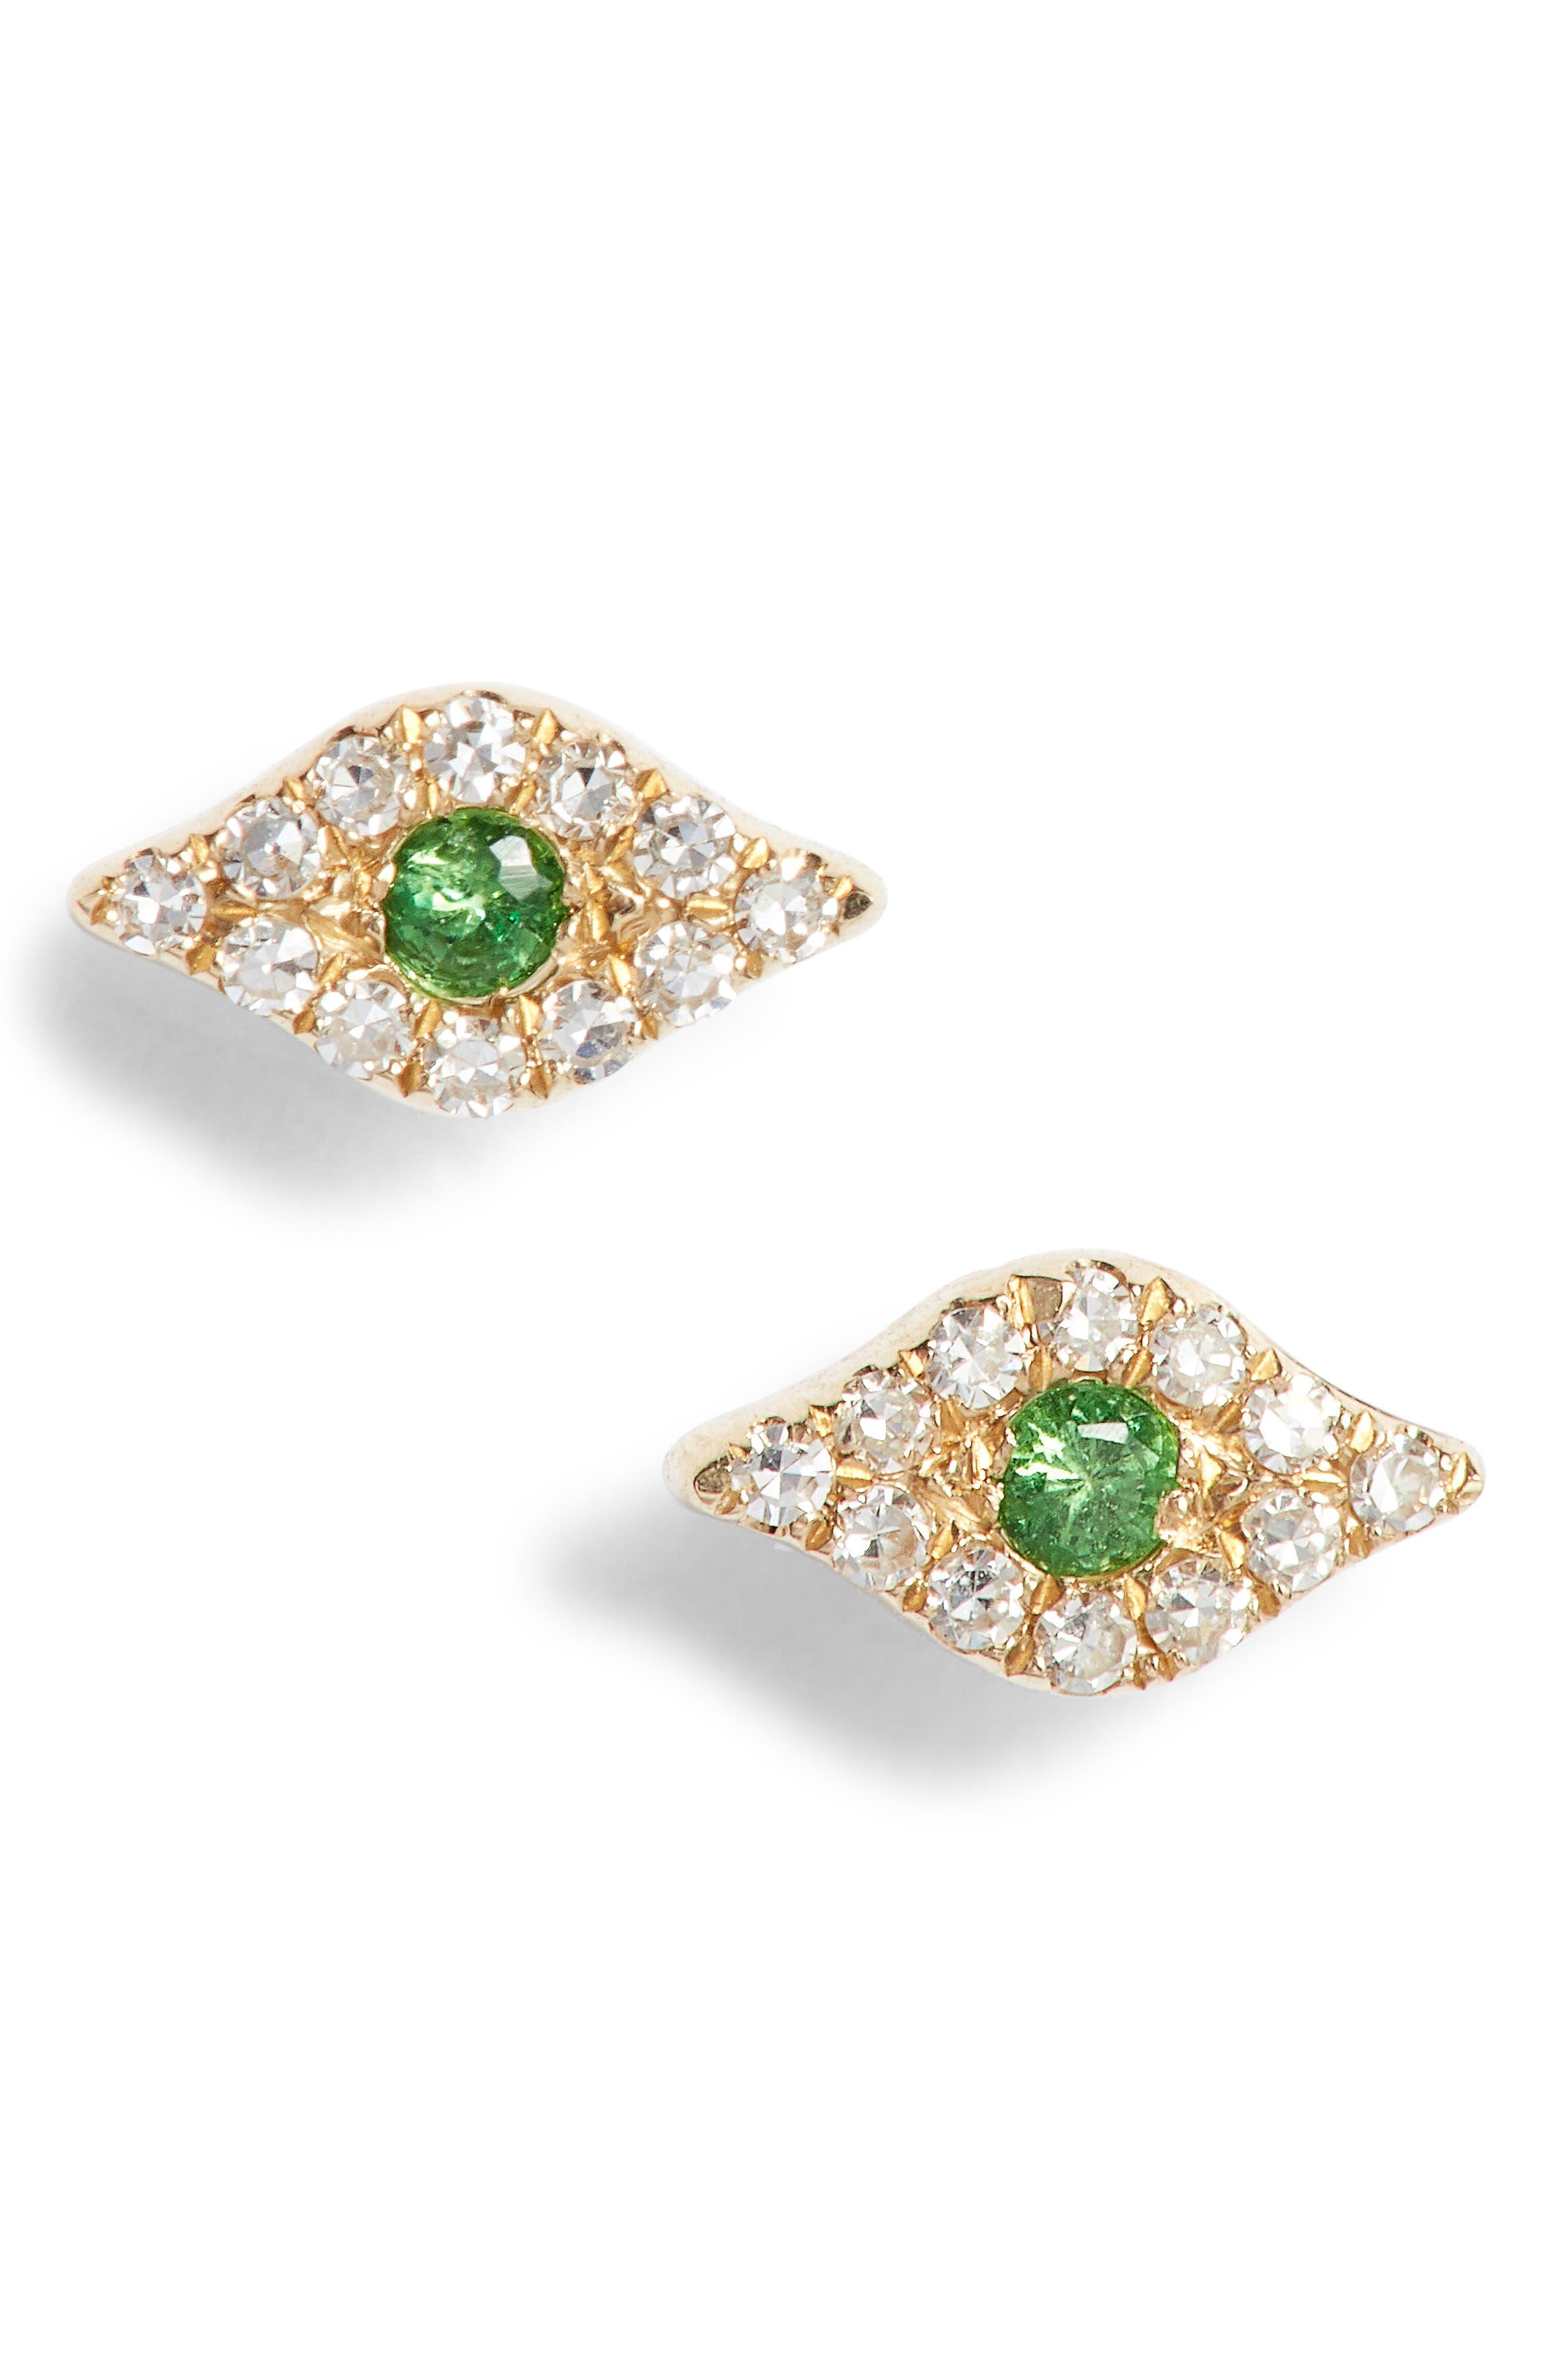 Evil Eye Diamond & Sapphire Stud Earrings,                             Main thumbnail 1, color,                             Yellow Gold/ Tsavorite